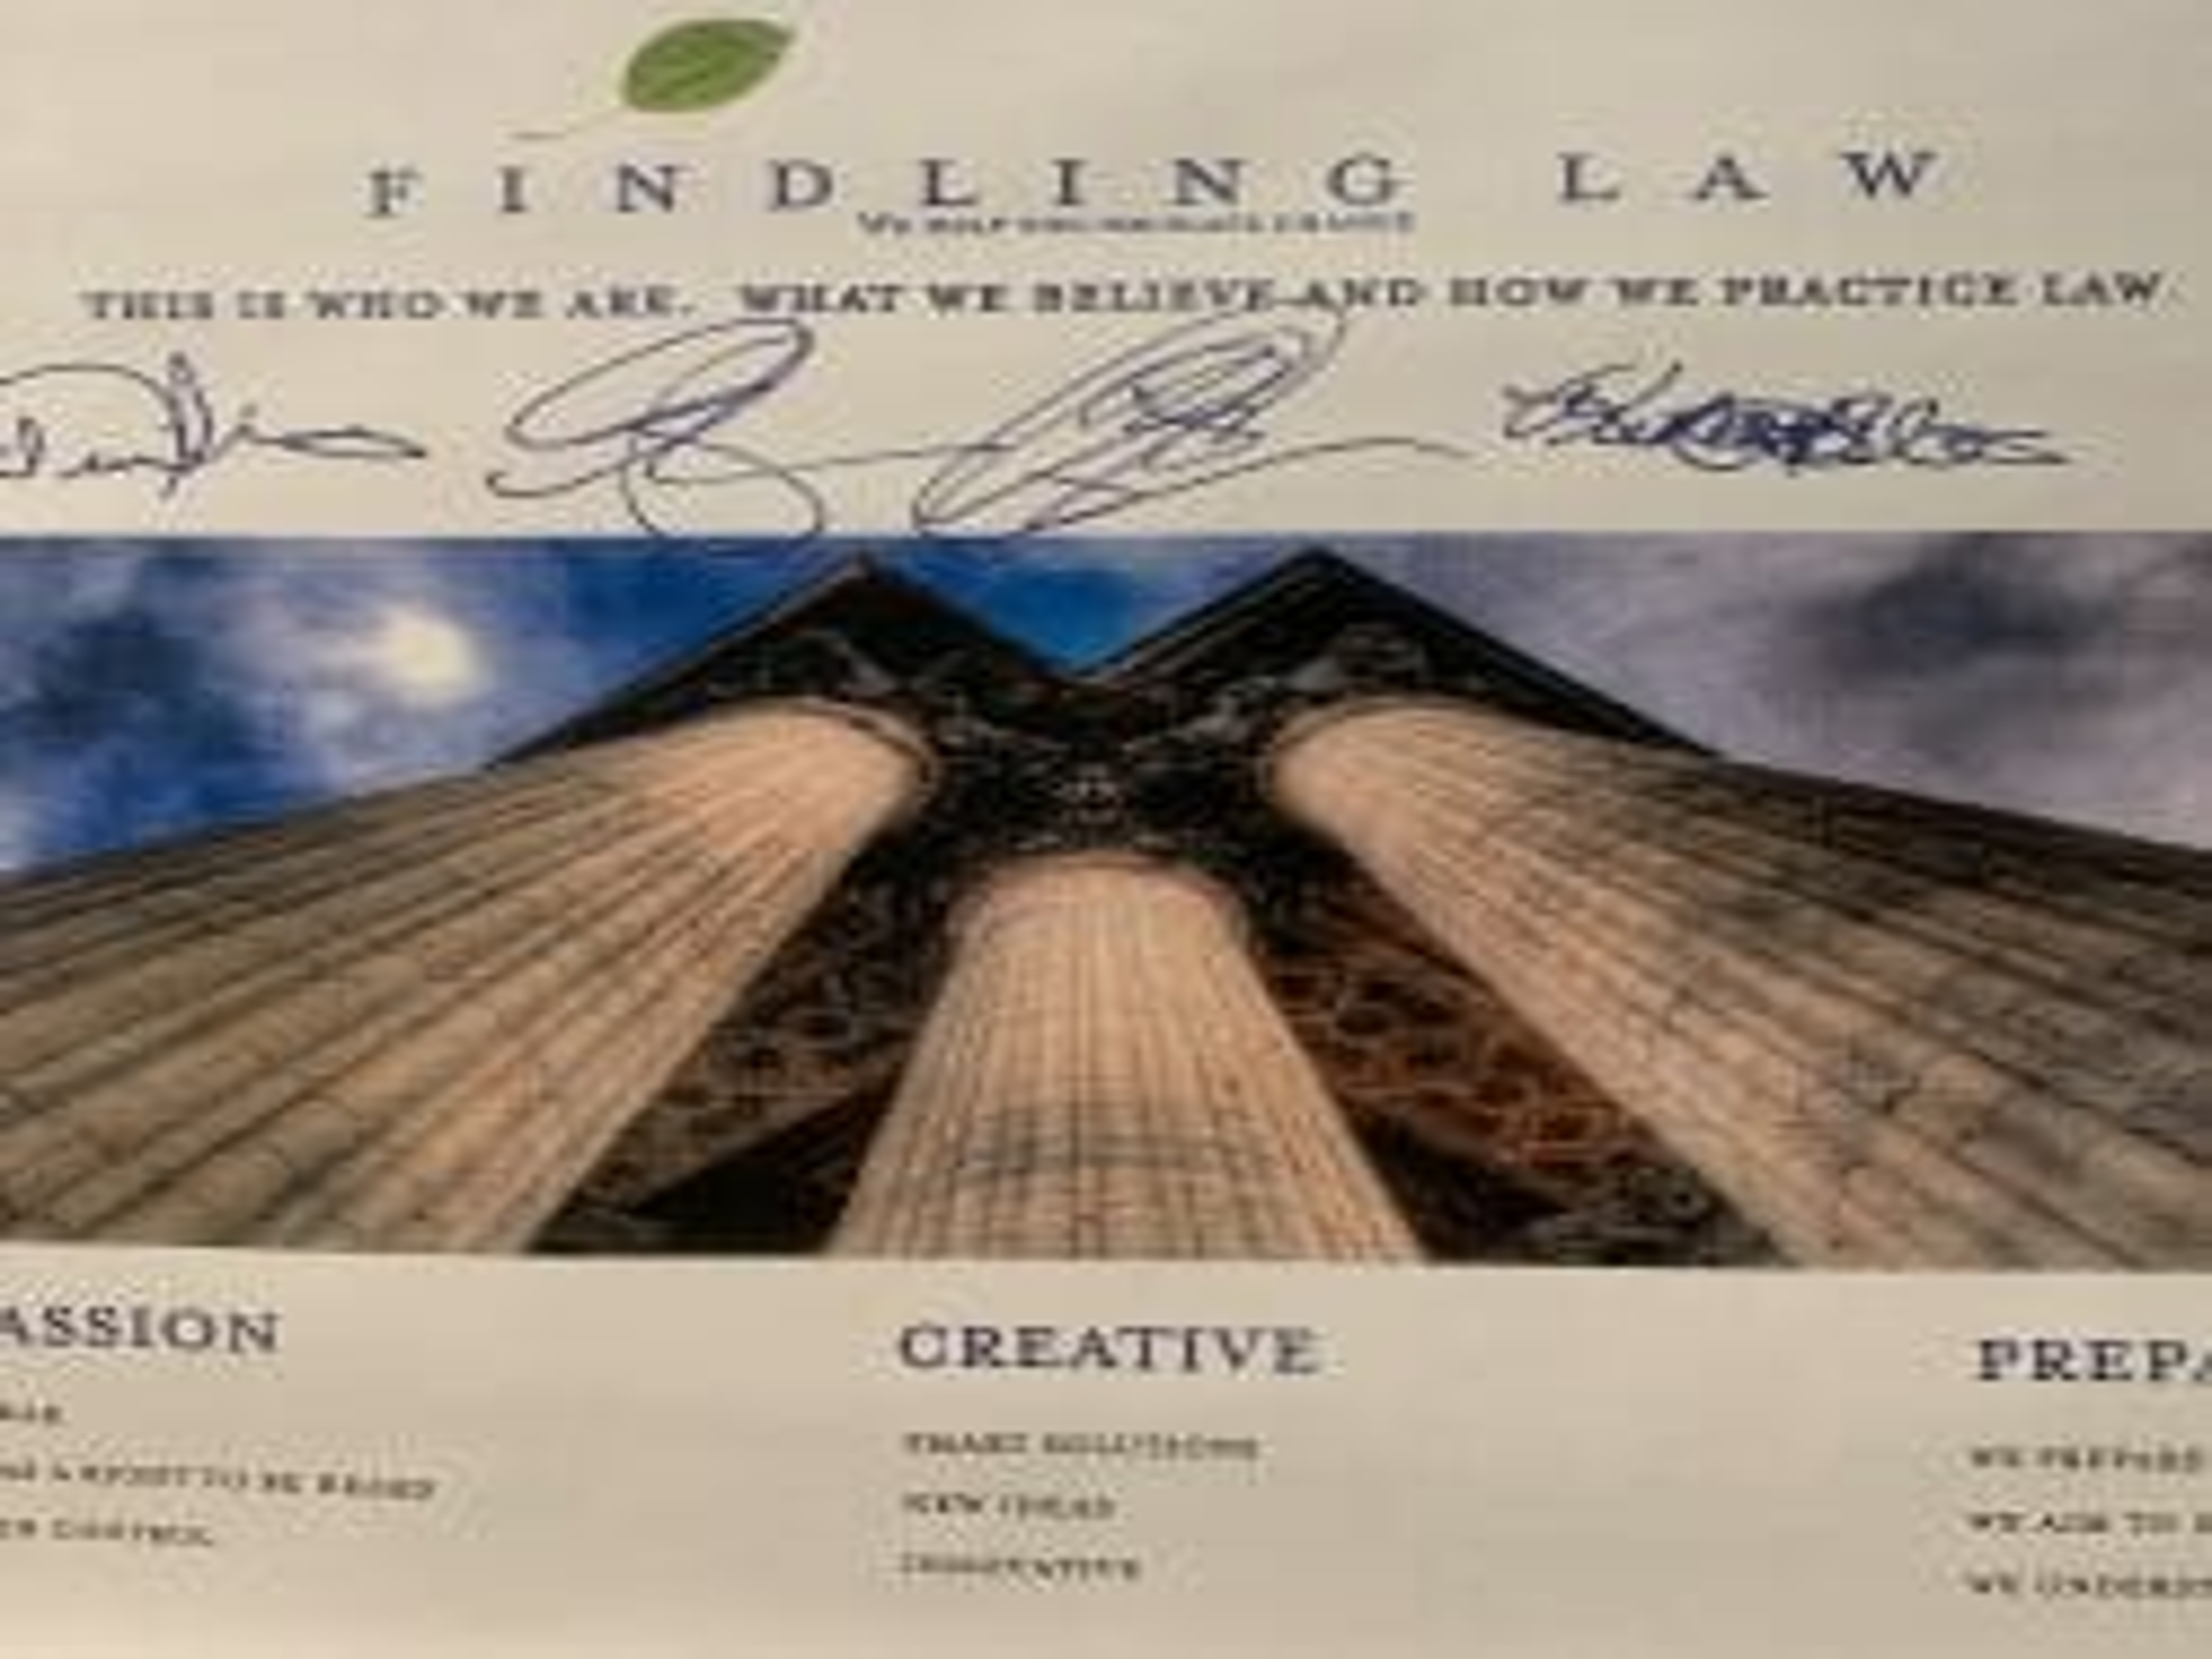 Findling Law